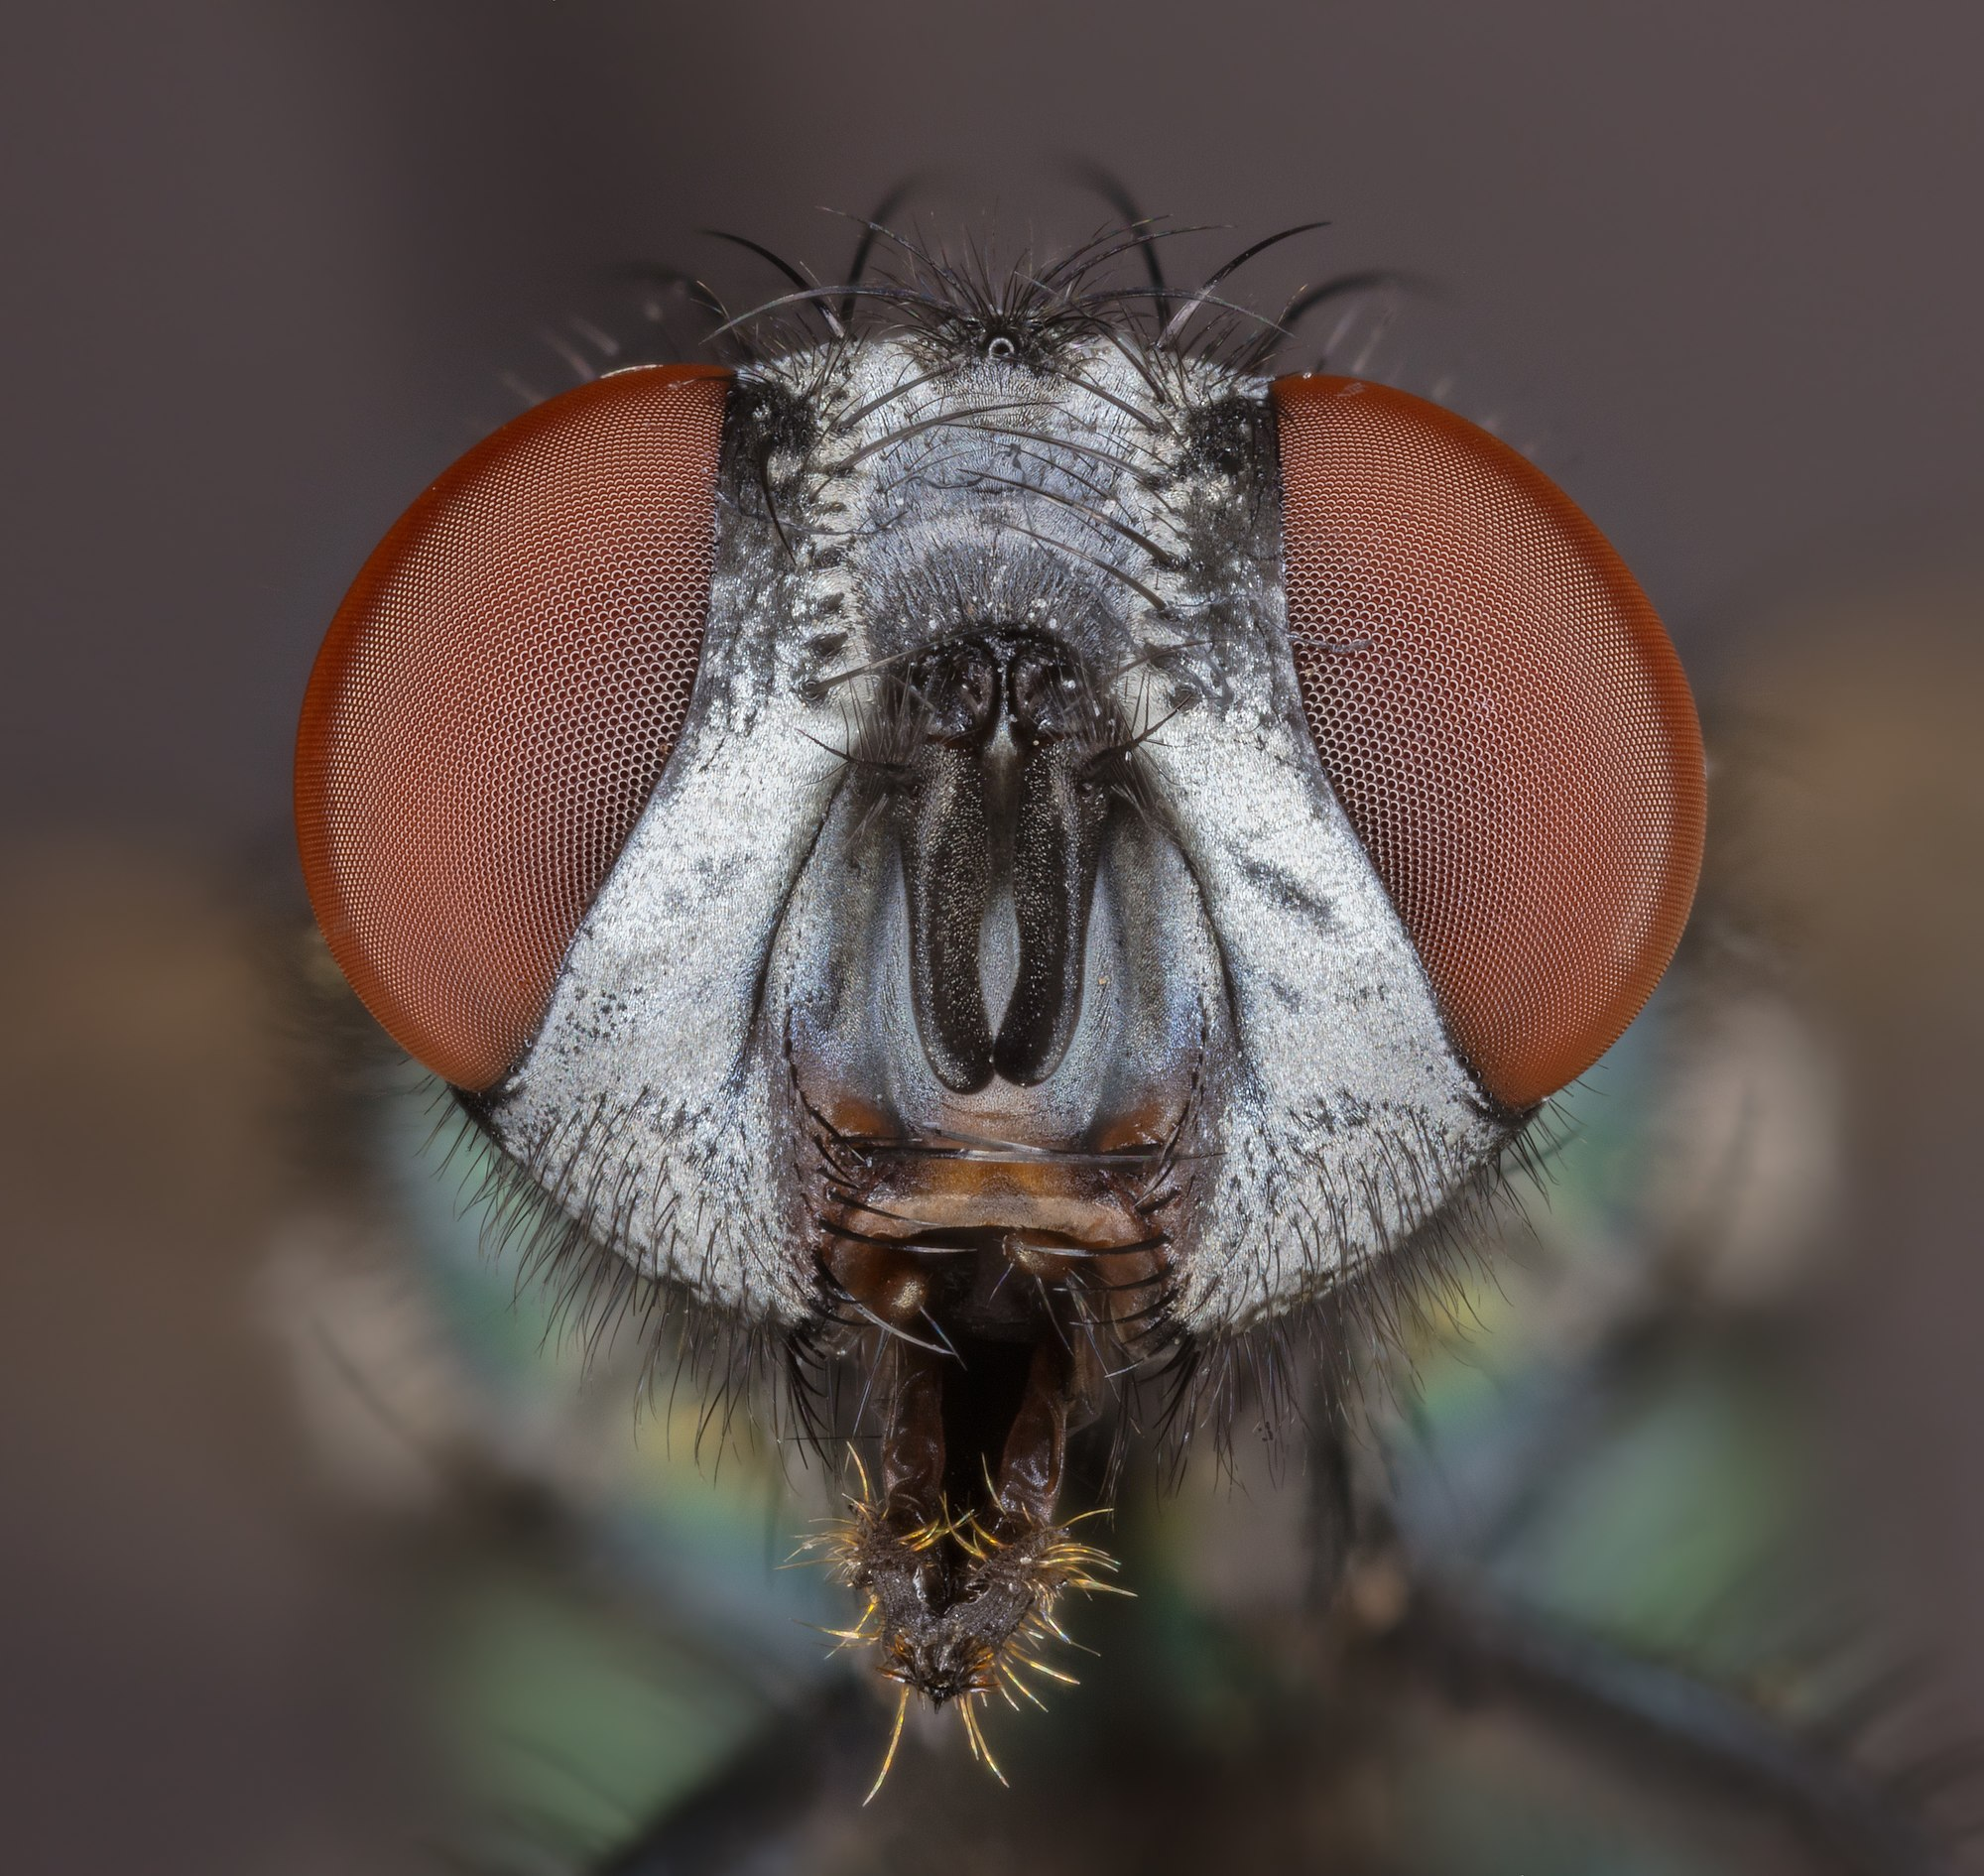 Common green bottle fly (Lucilia sericata), Hartelholz, Munich, Germany